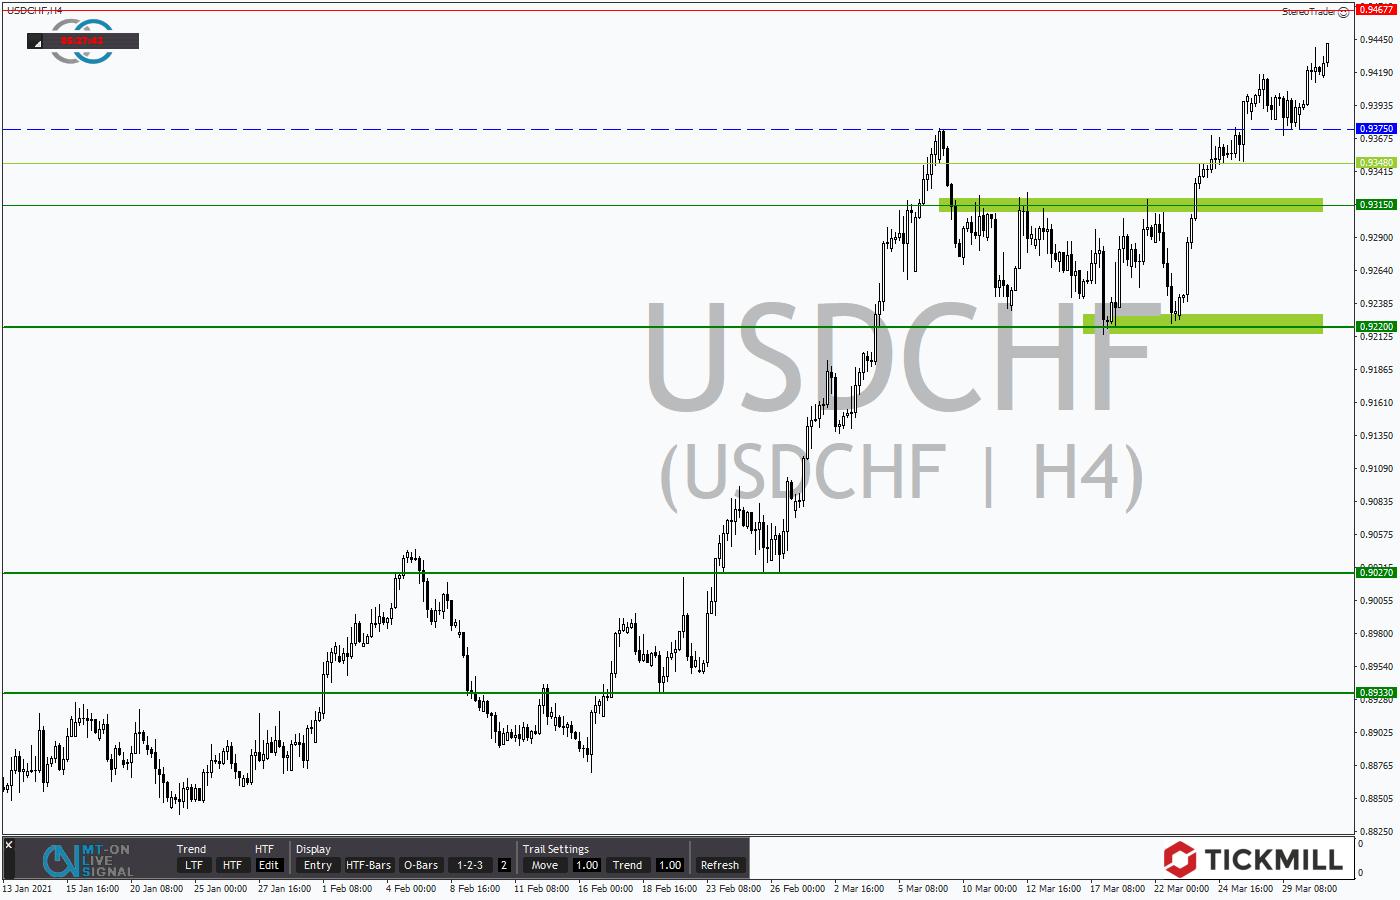 Tickmill-Analyse: USDCHF im 4-Stundenchart